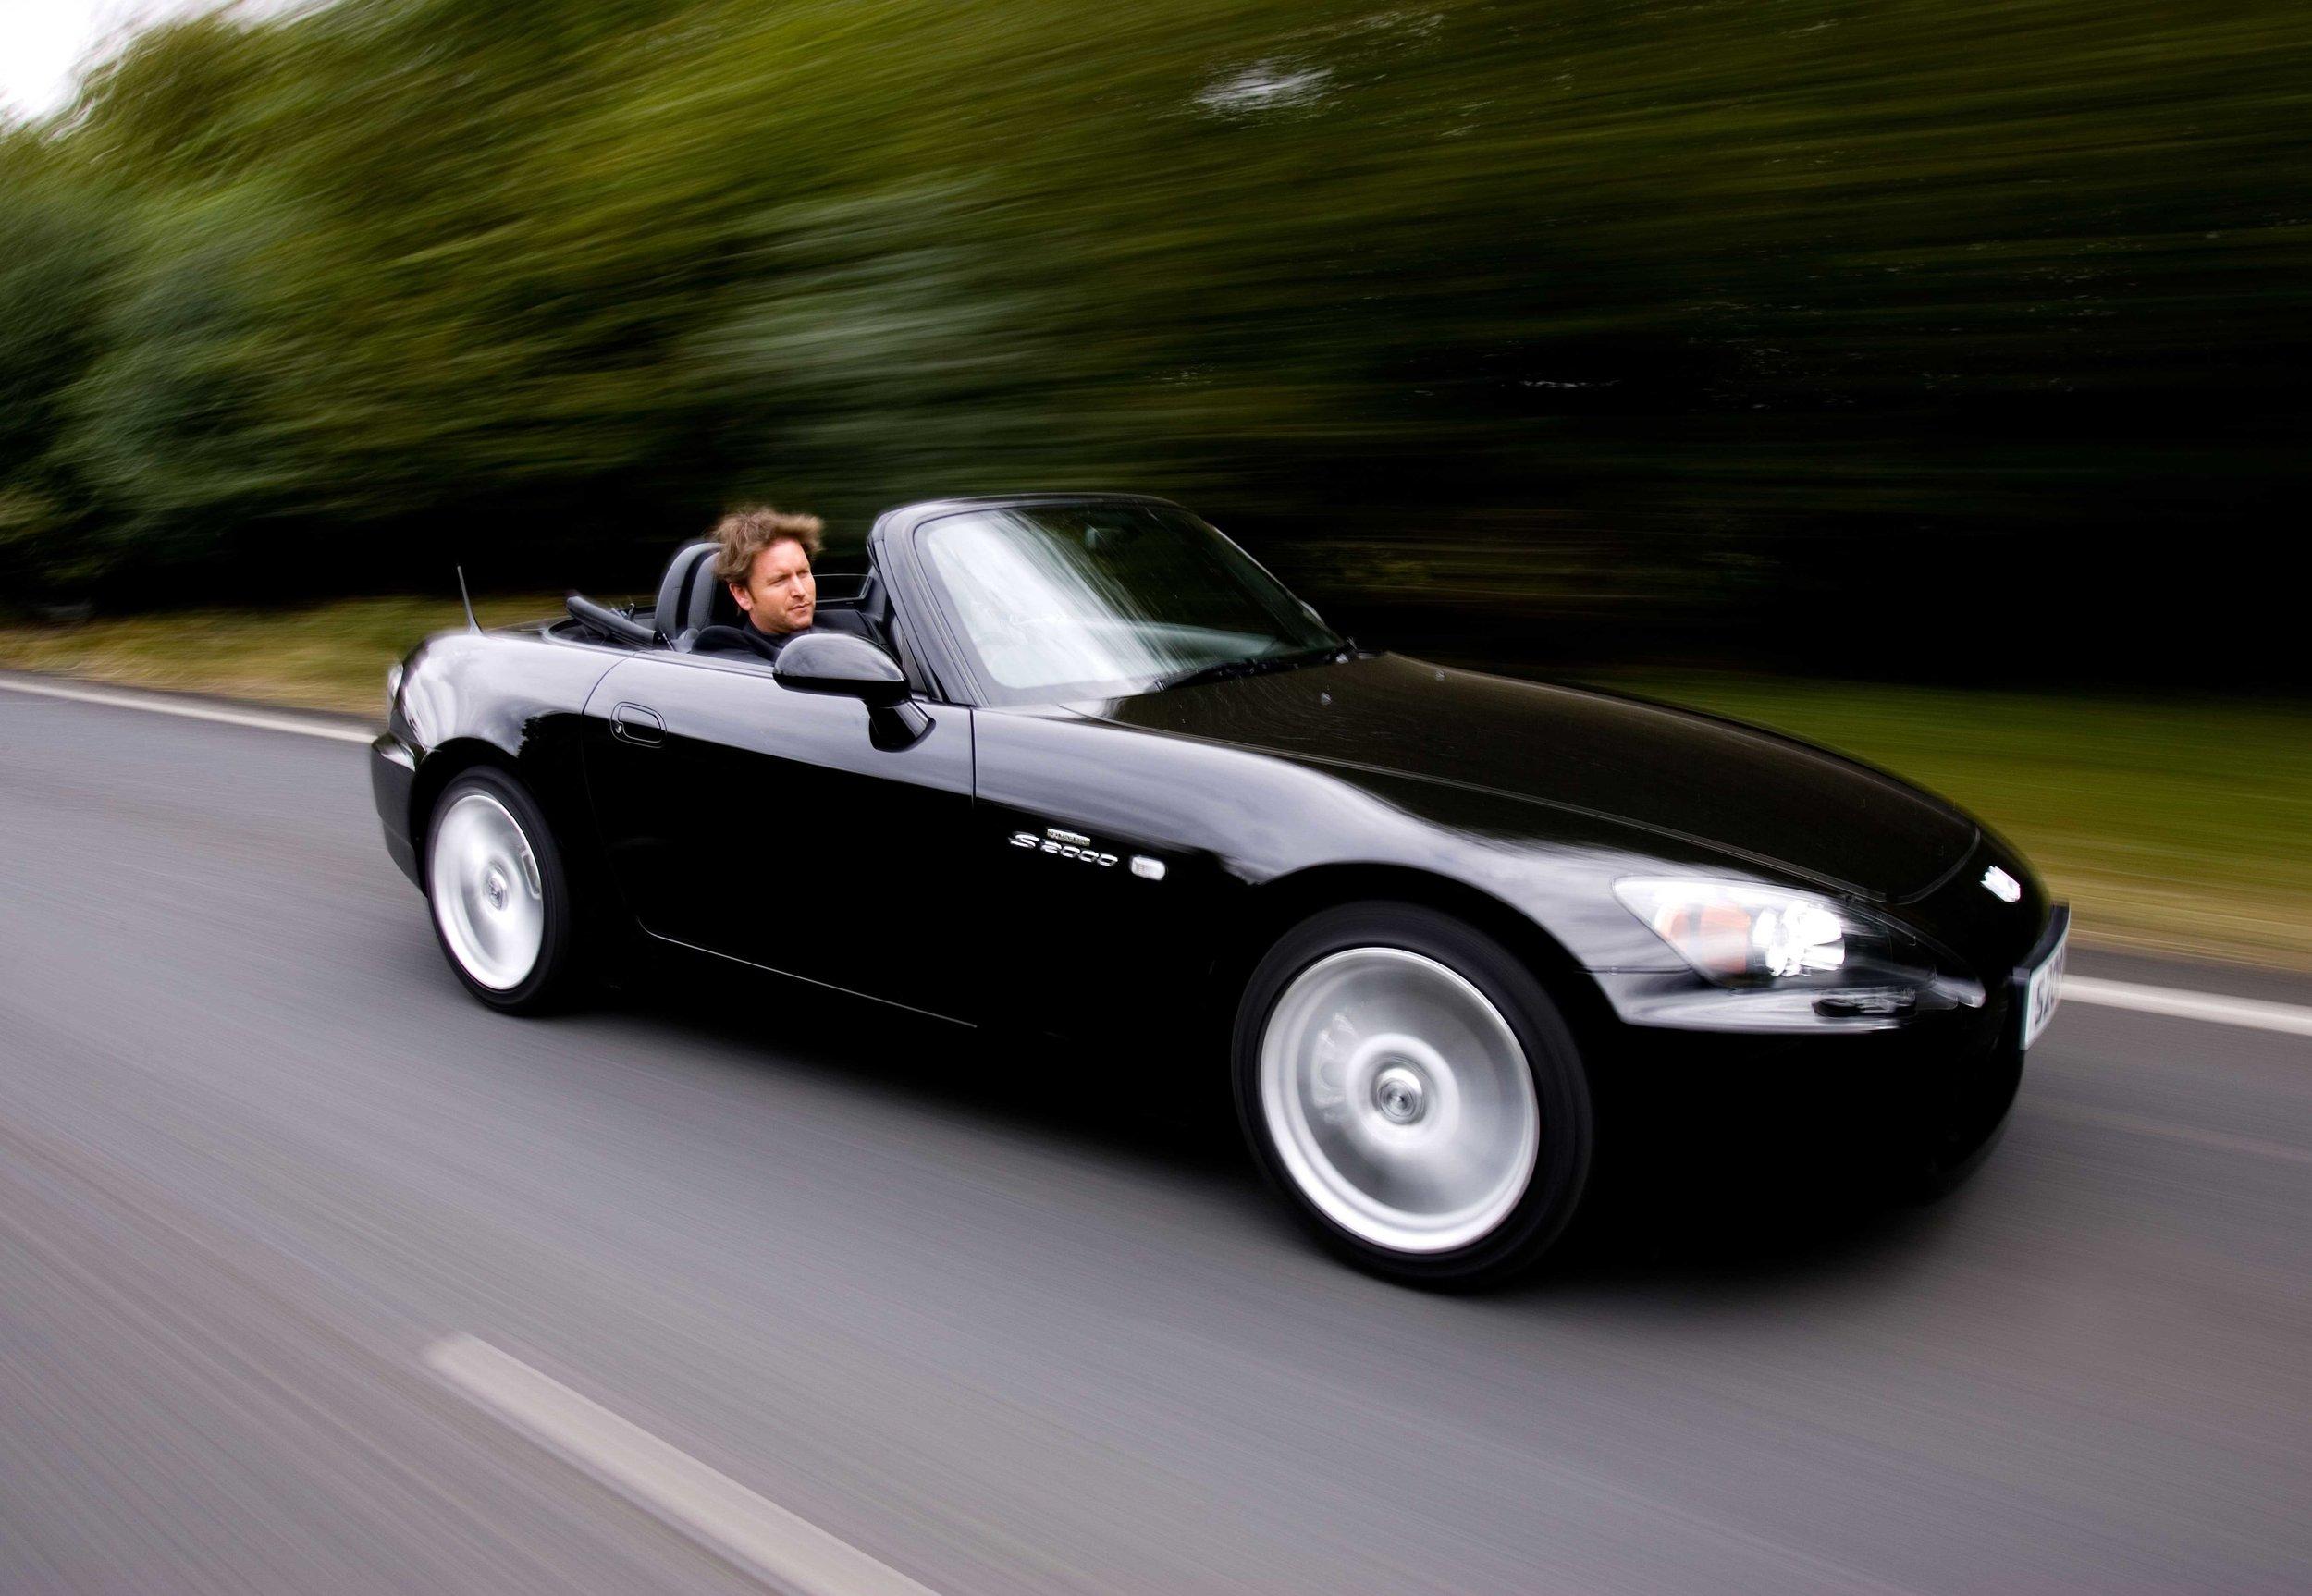 JamesMartin-Driving.jpg